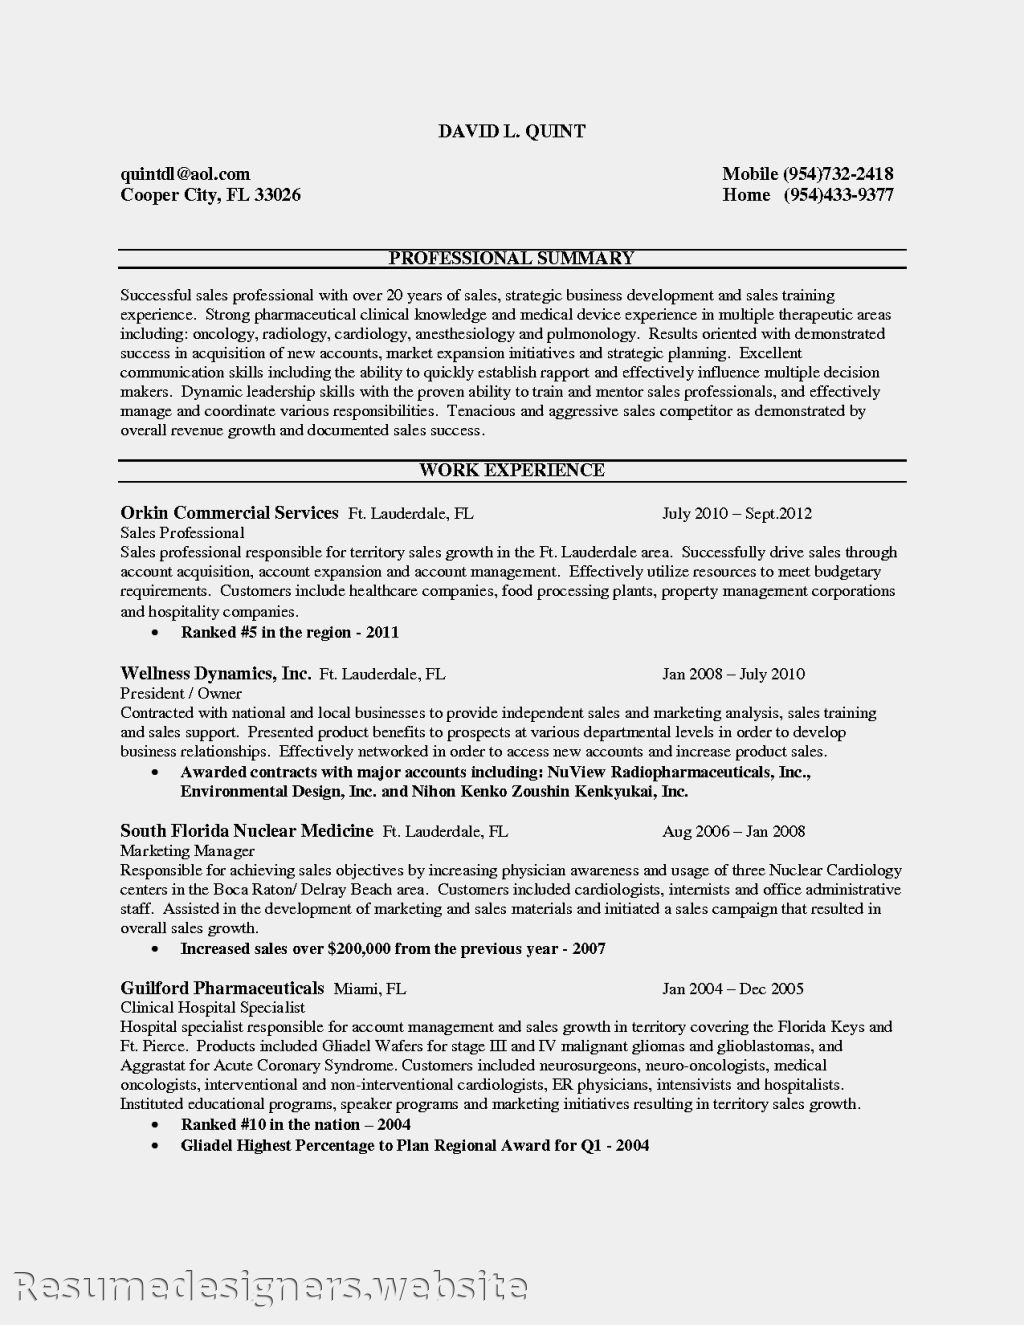 716 resume for medical sales entry level